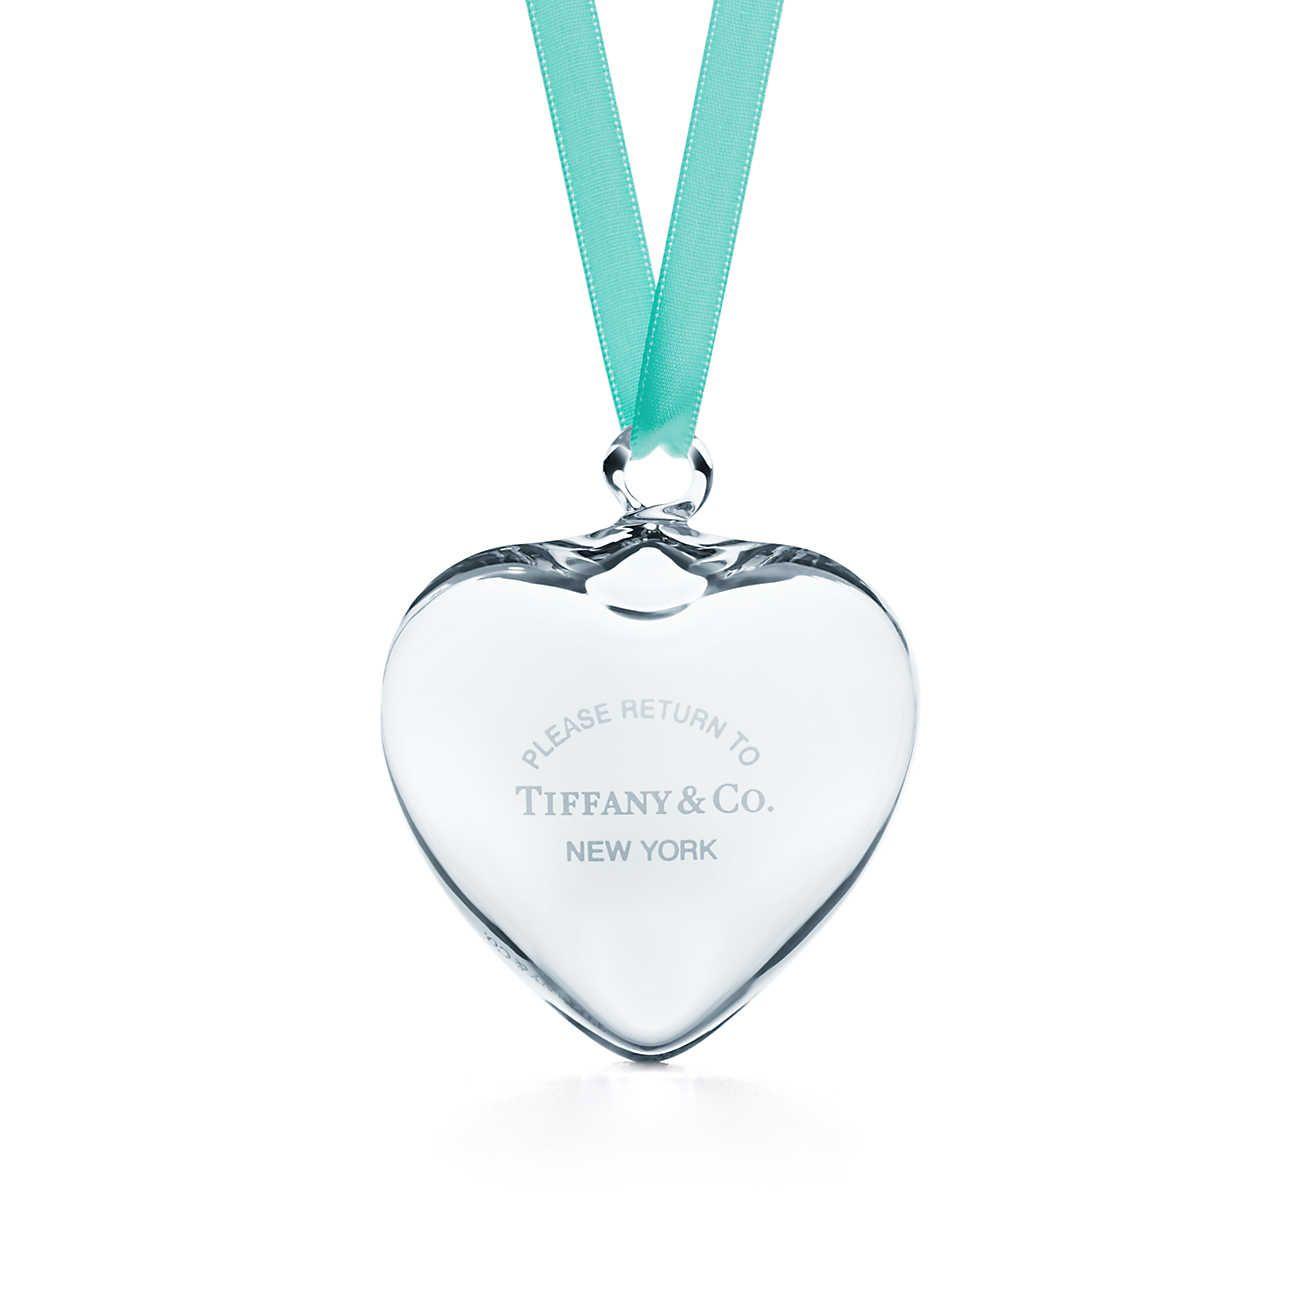 a9fa64b22 Return to Tiffany®:Heart Ornament   Tiffany & Co. Christmas ...